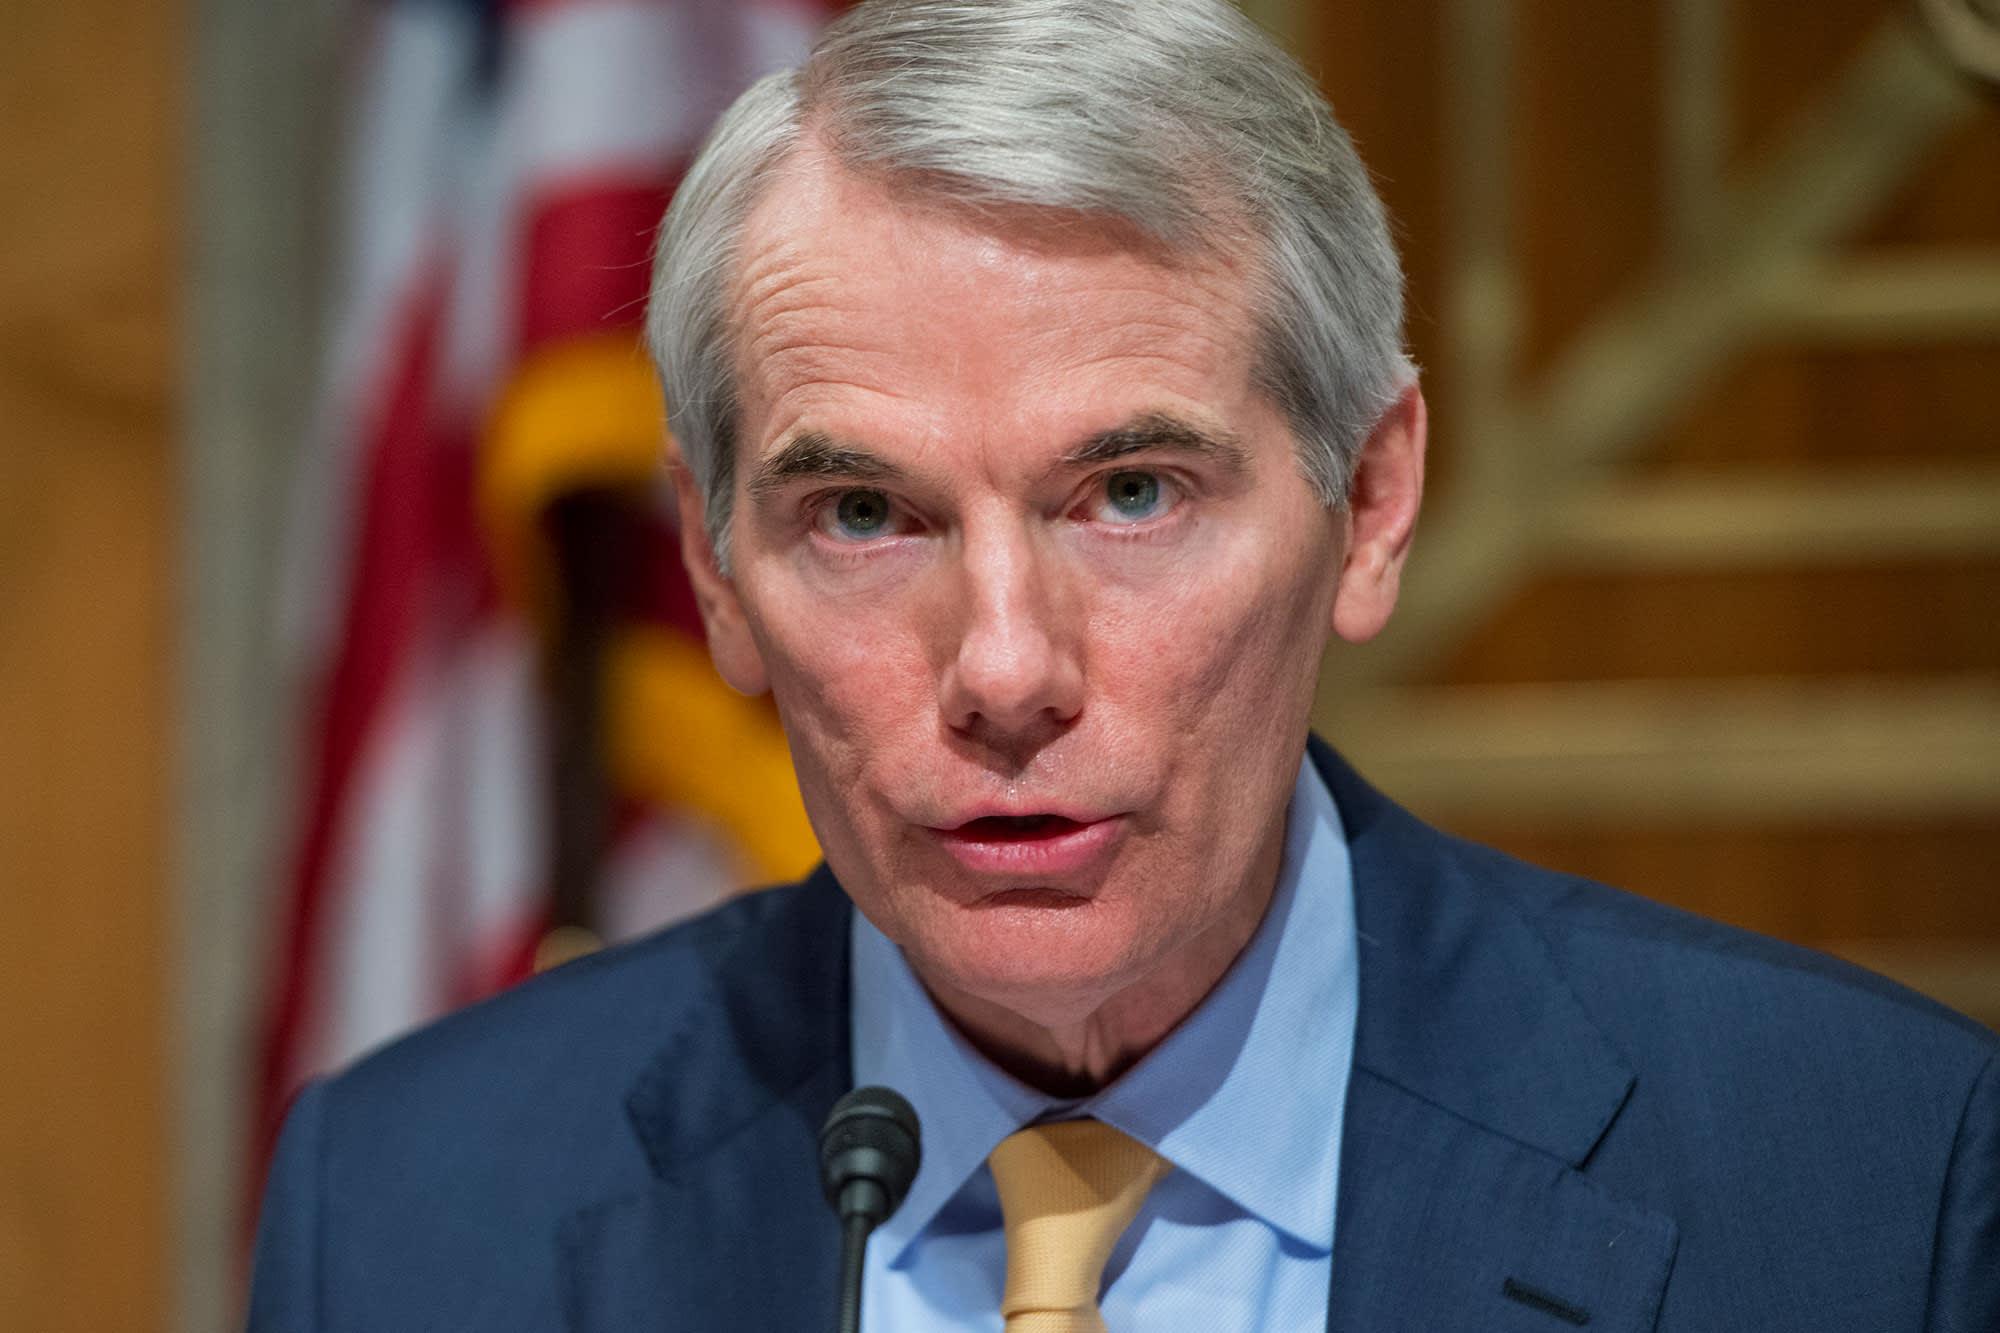 GOP senator urges Congress to pass unemployment benefit replacement by Friday – CNBC